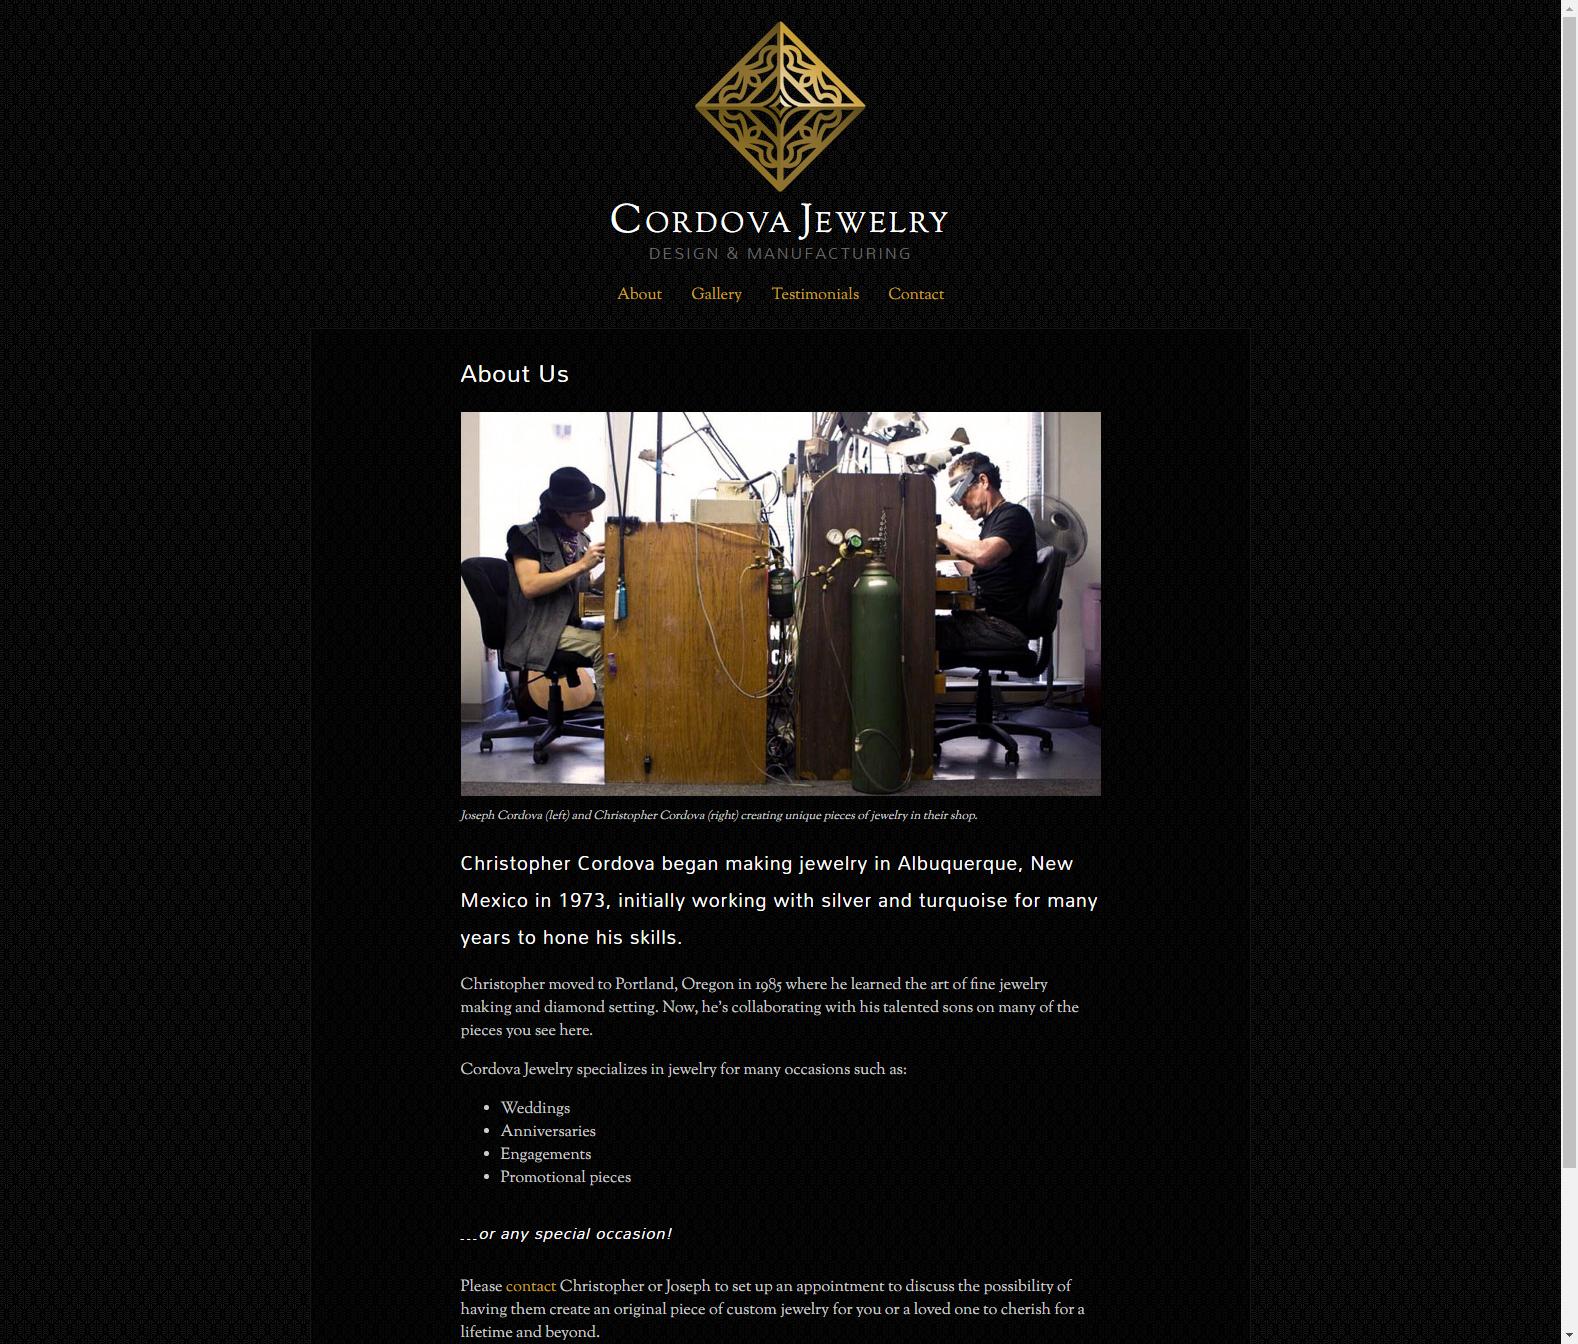 Cordova Jewelry - About Page